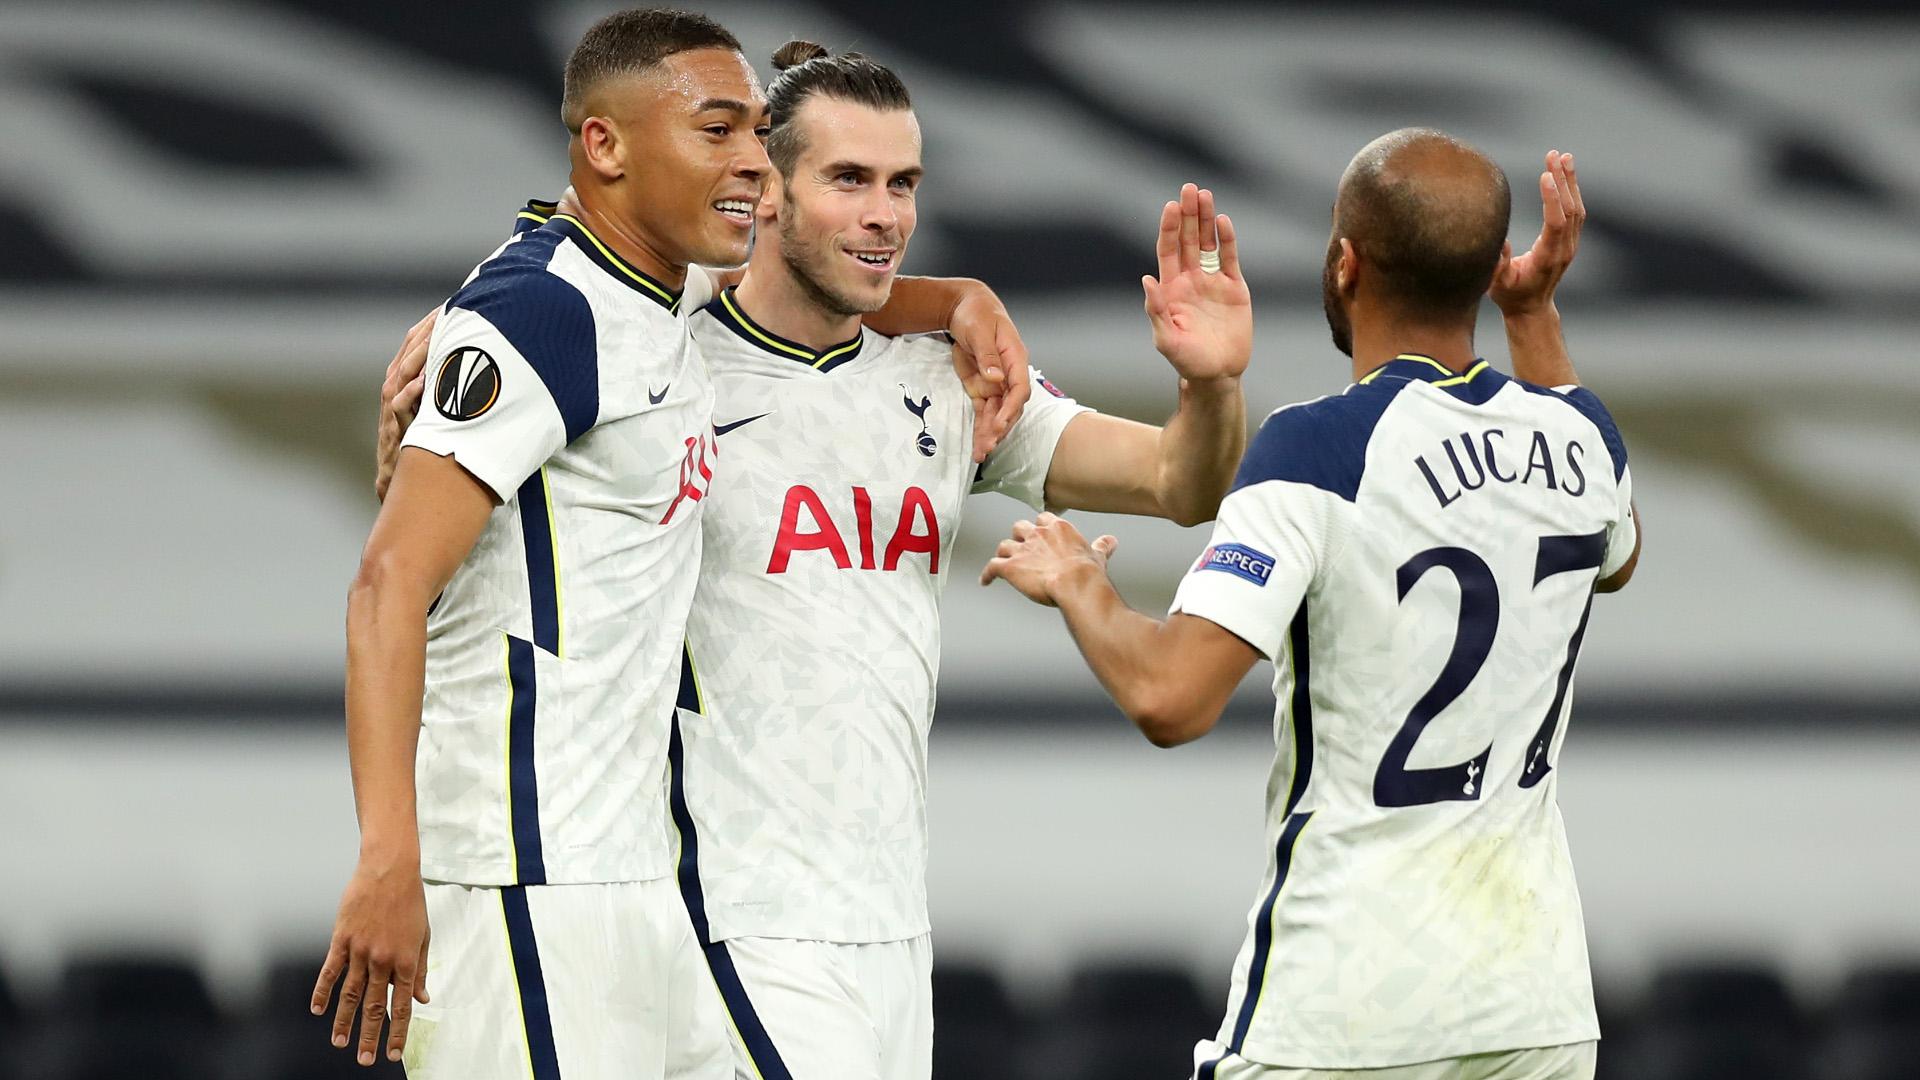 Tottenham 3-0 LASK: Bale starts as Spurs ease to Europa League win